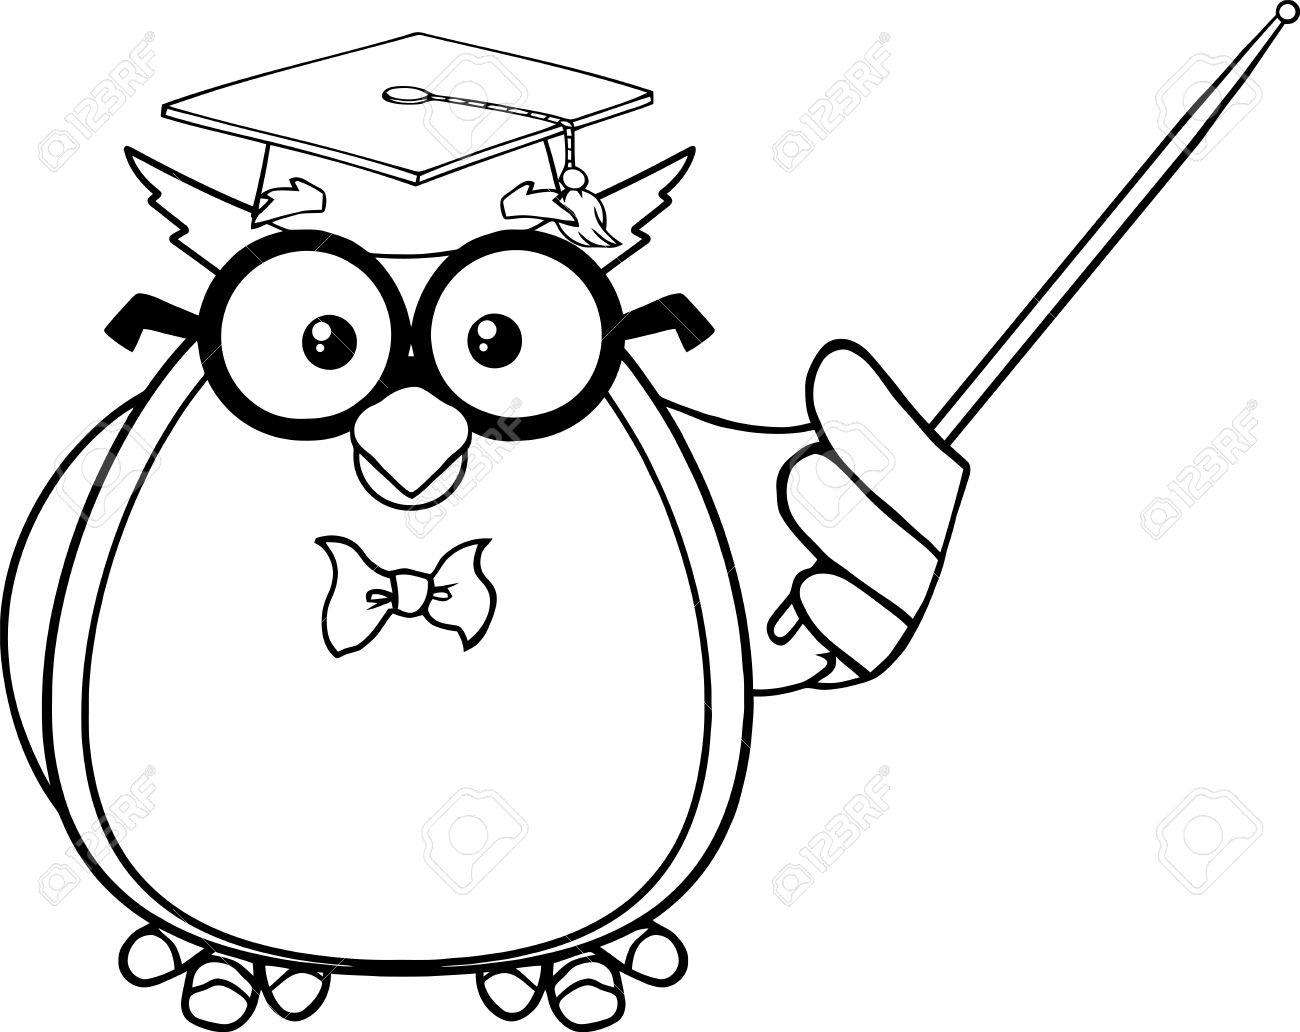 1300x1032 Black And White Wise Owl Teacher Cartoon Mascot Character